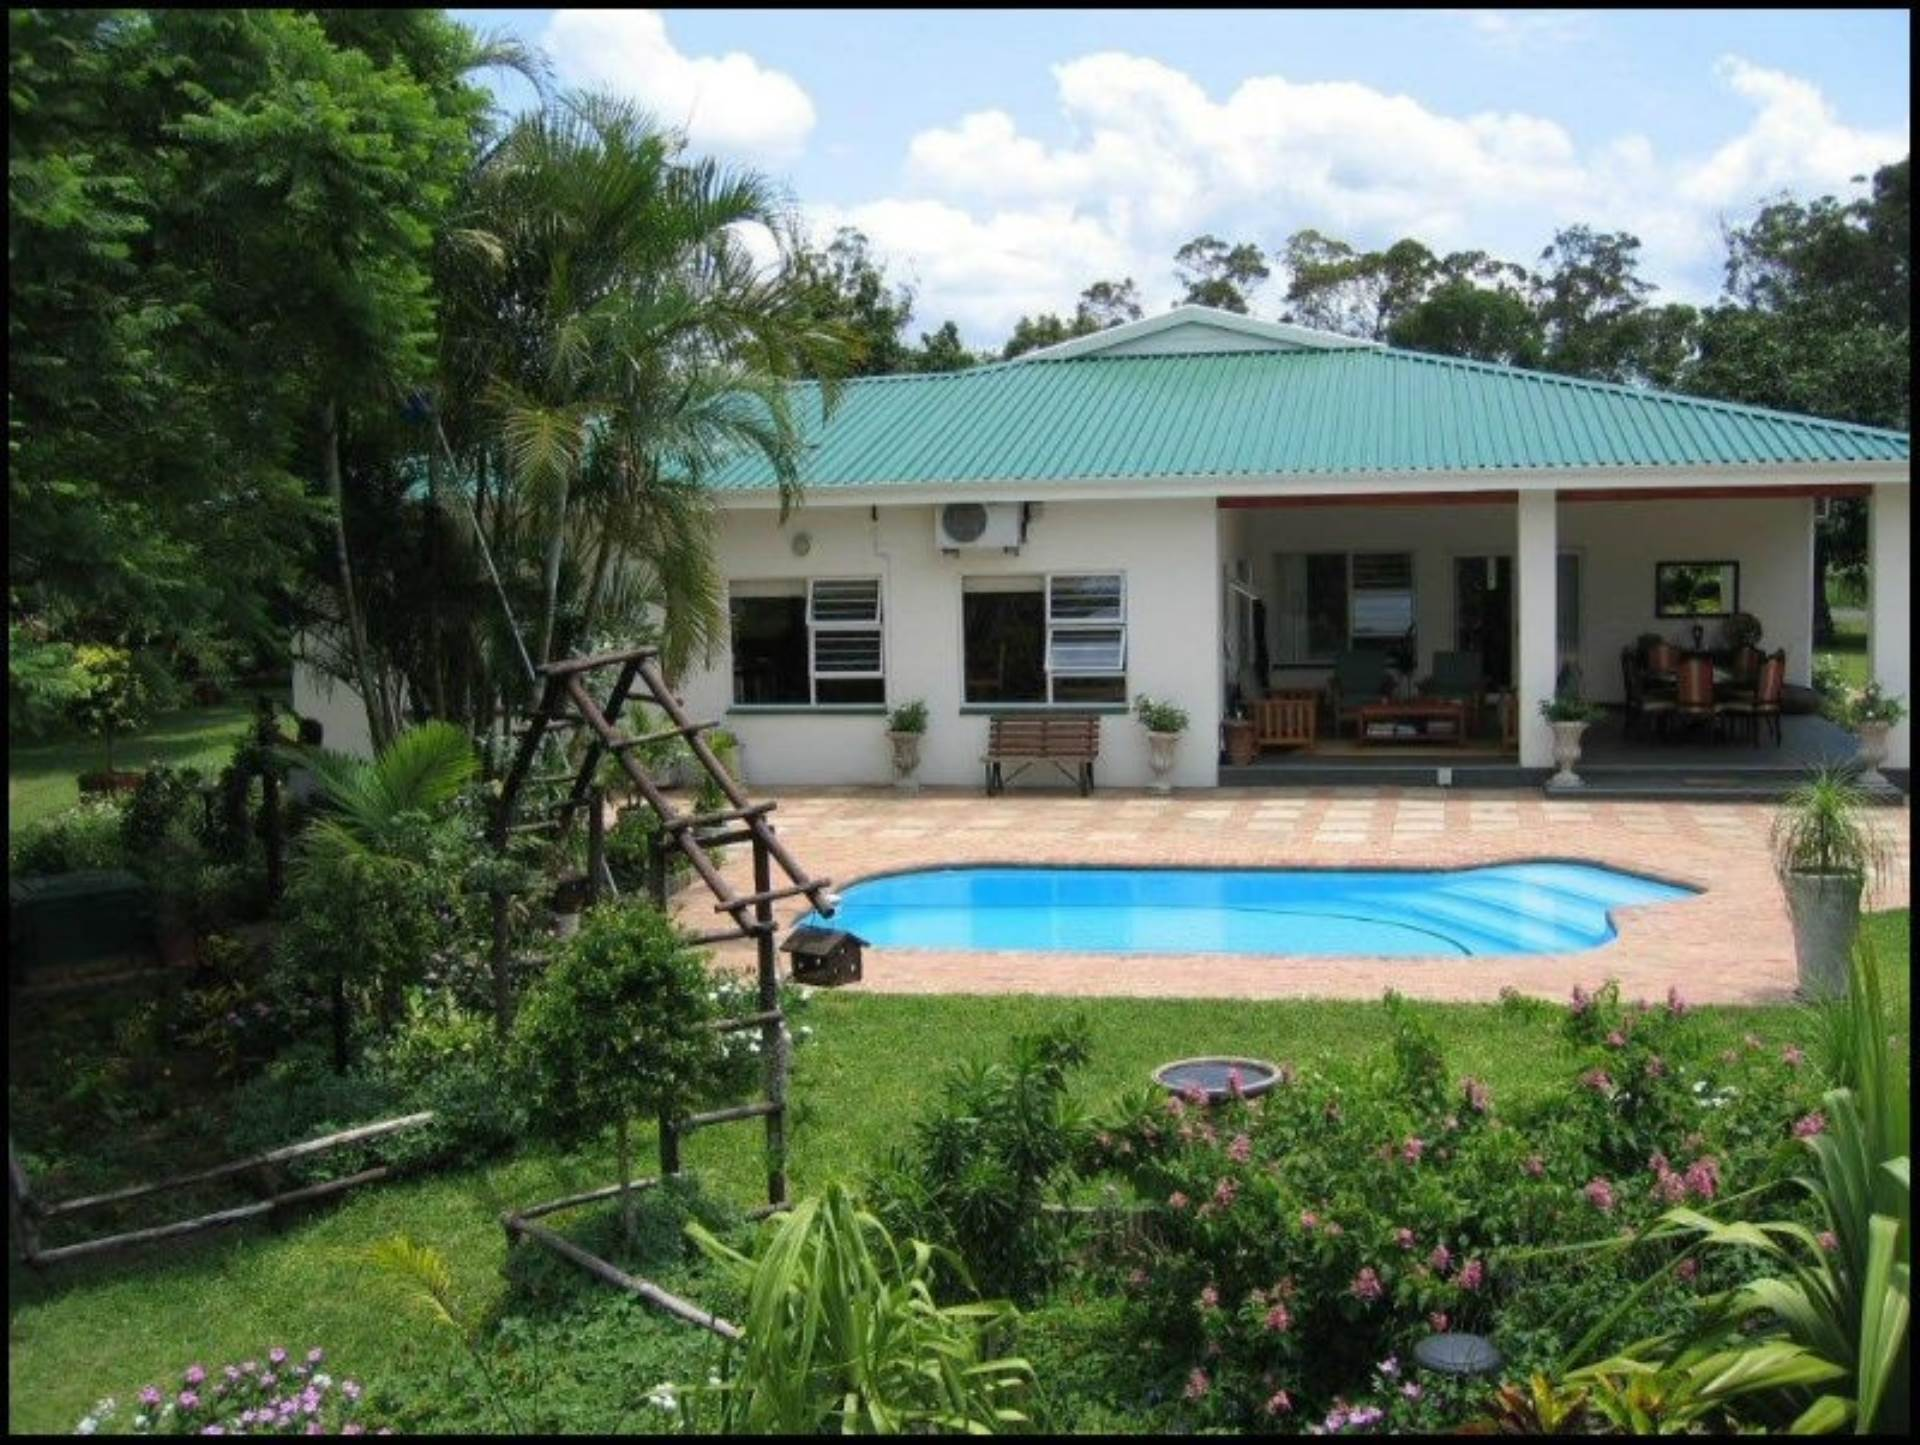 3 BedroomHouse For Sale In Mtubatuba